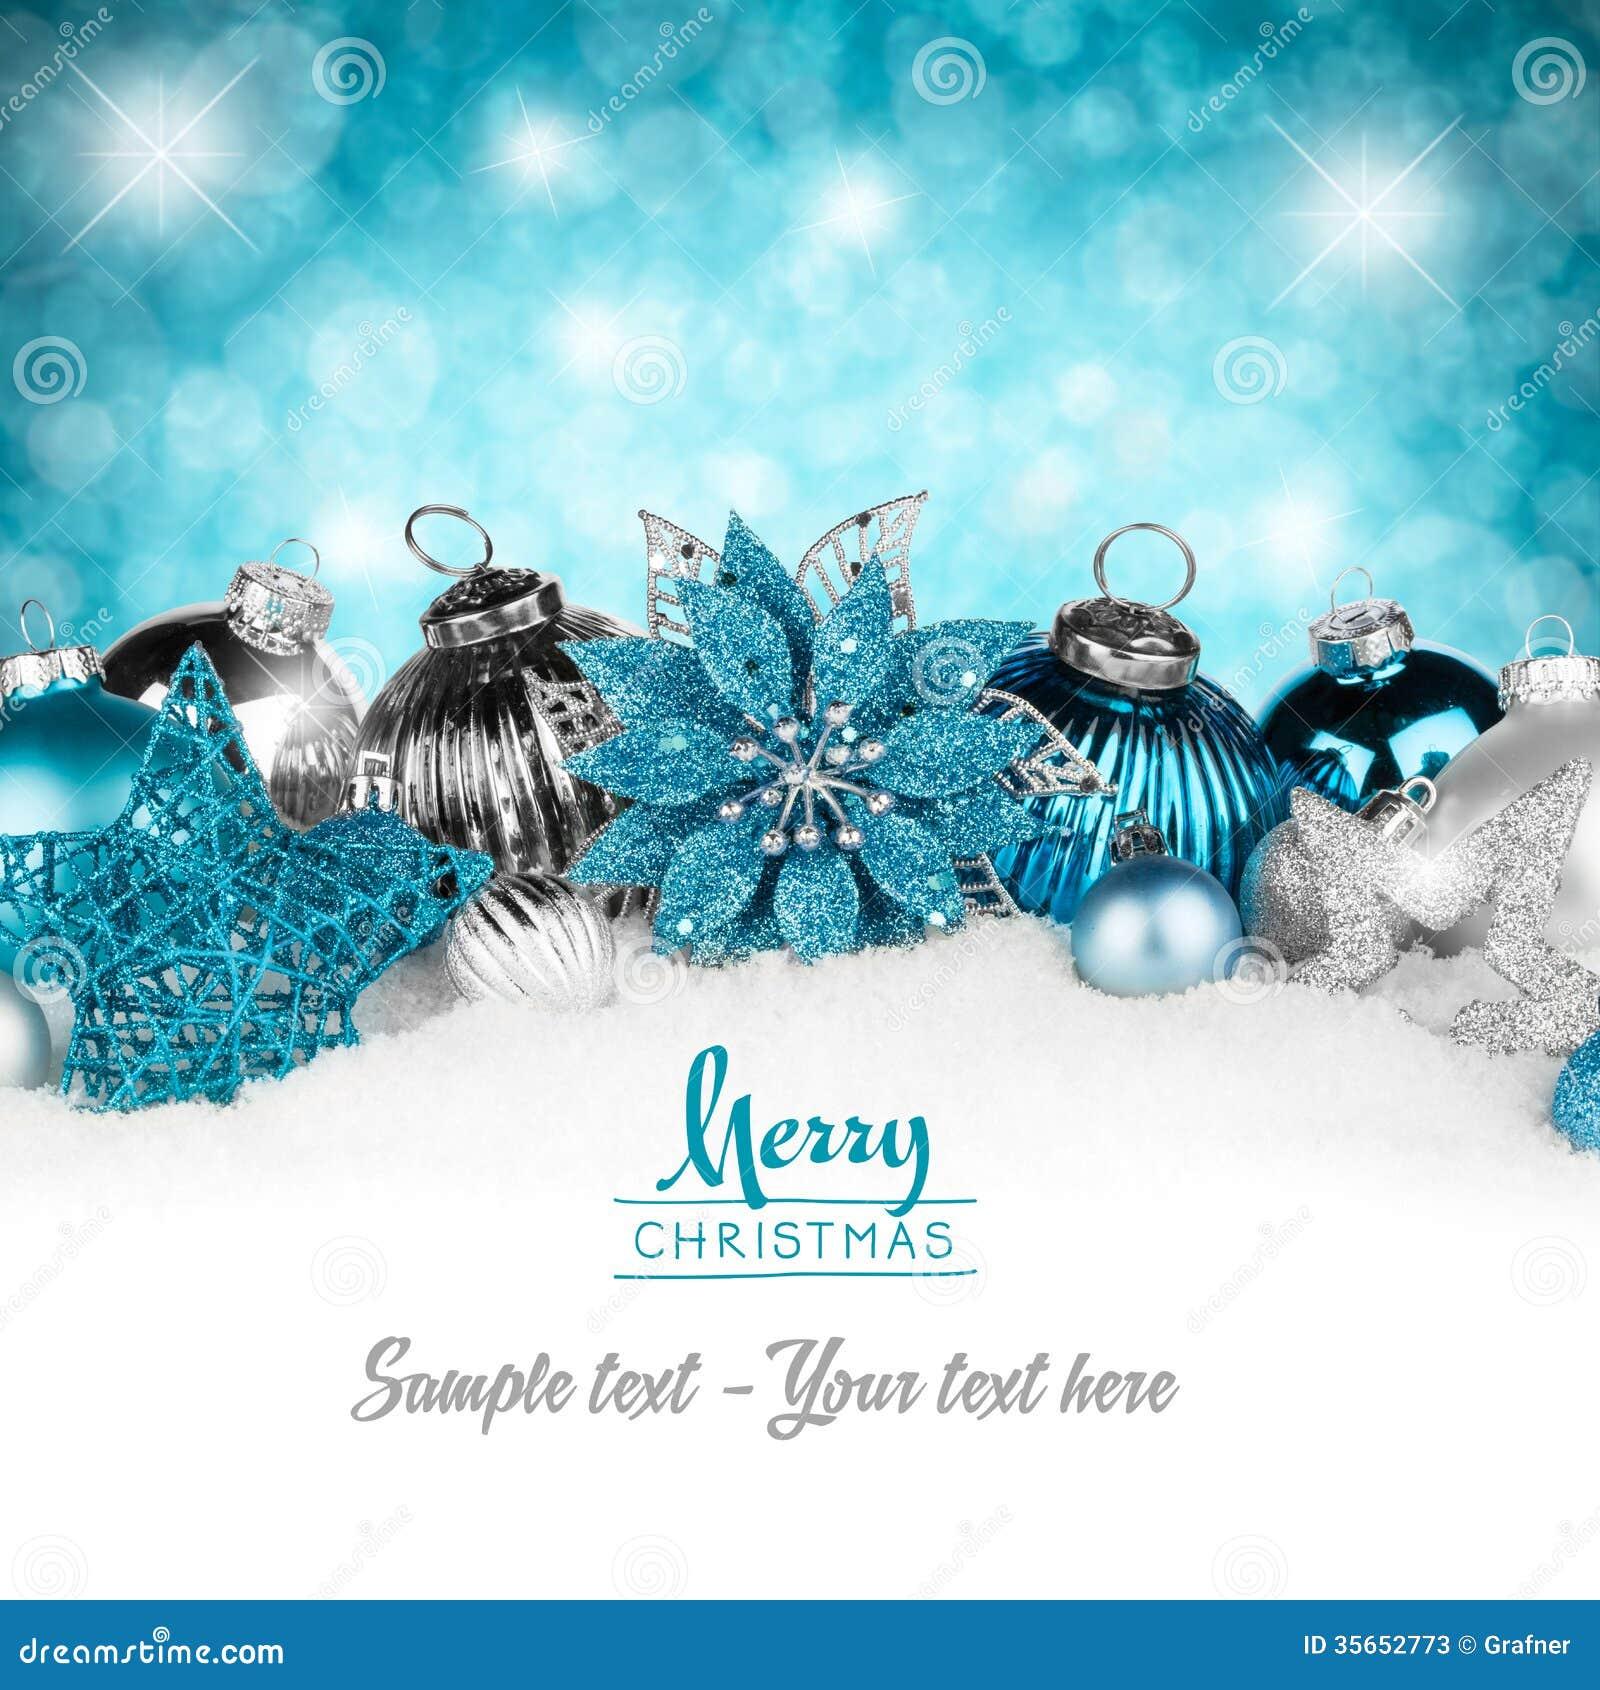 Silver petrol christmas card